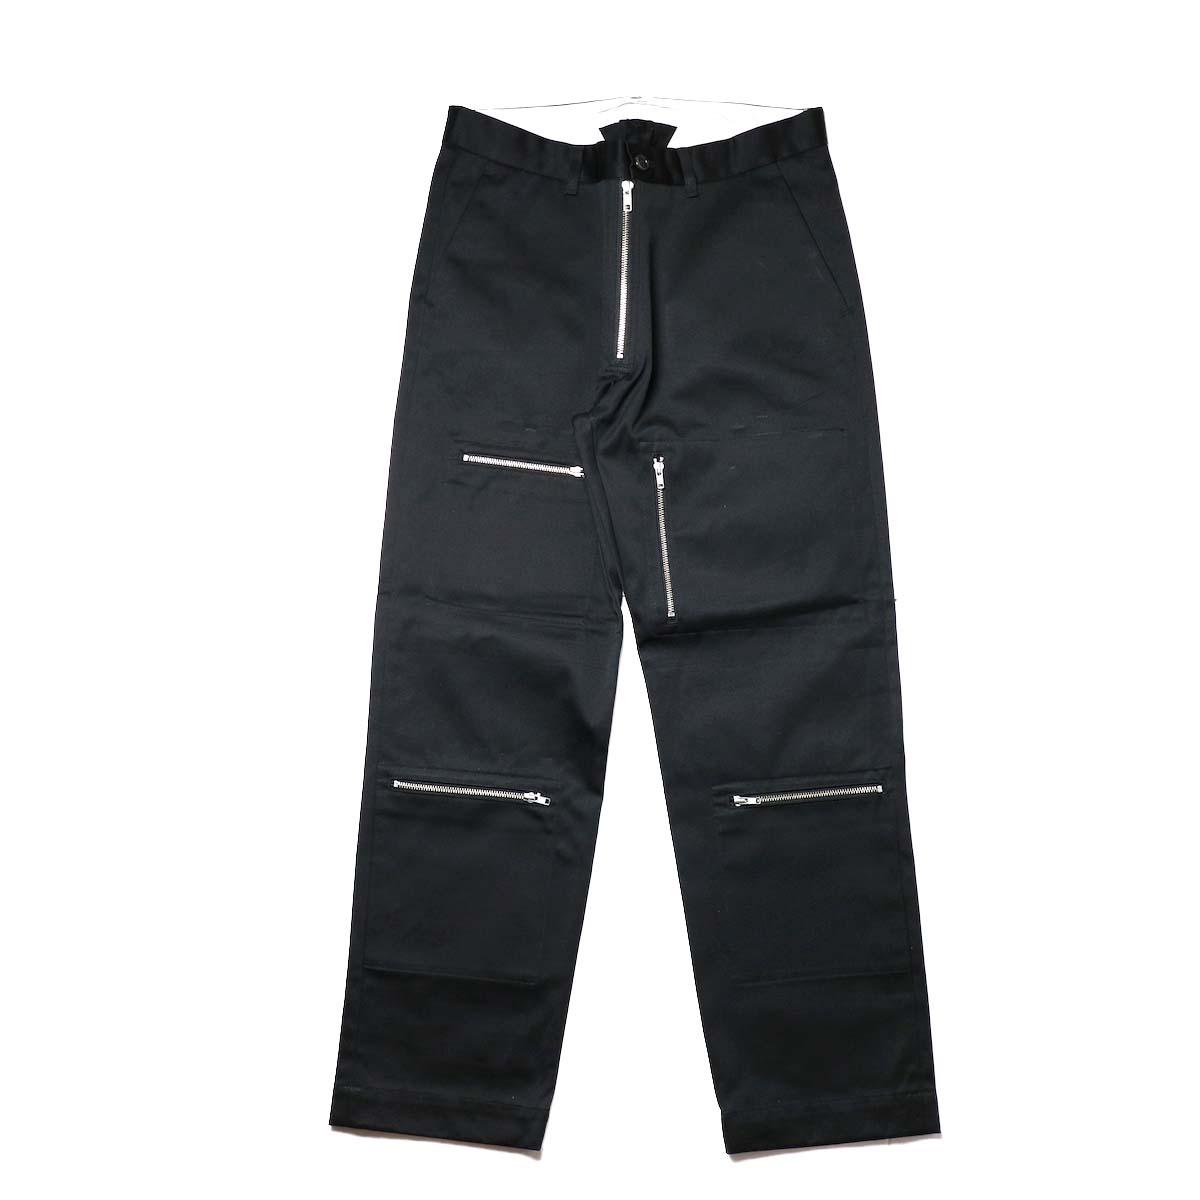 FUTURE PRIMITIVE / FP FZ FLIGHT CHINO PANTS (Black)正面